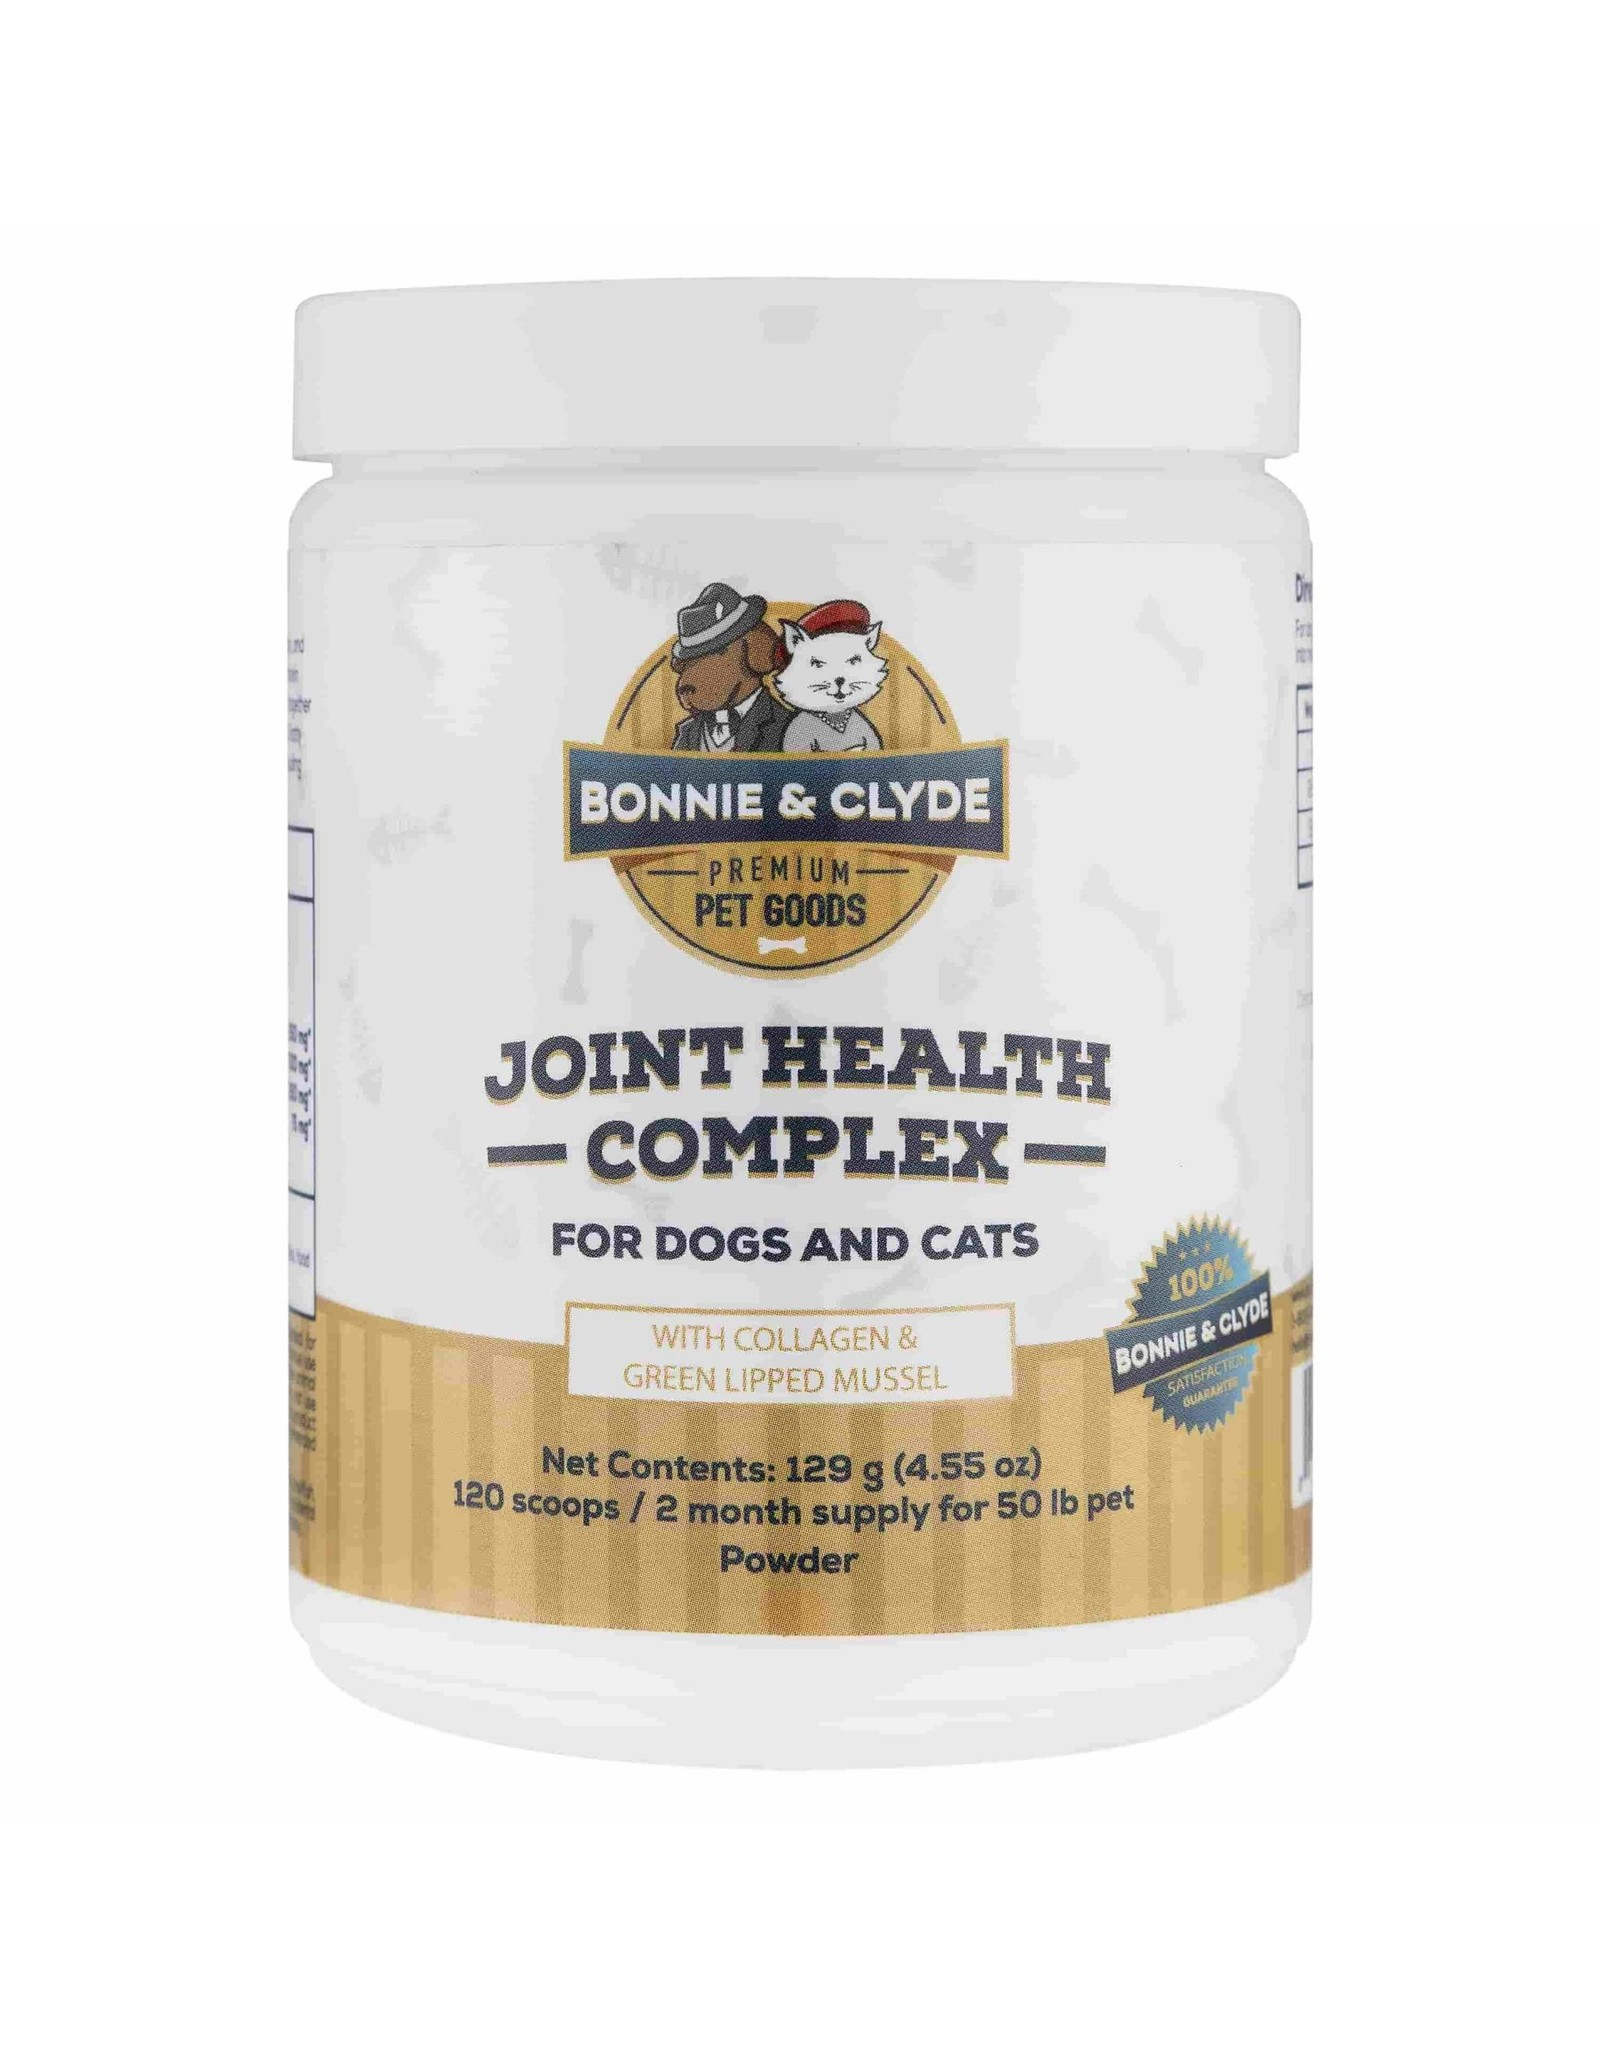 Bonnie & Clyde Bonnie & Clyde Joint Health Complex 129 g